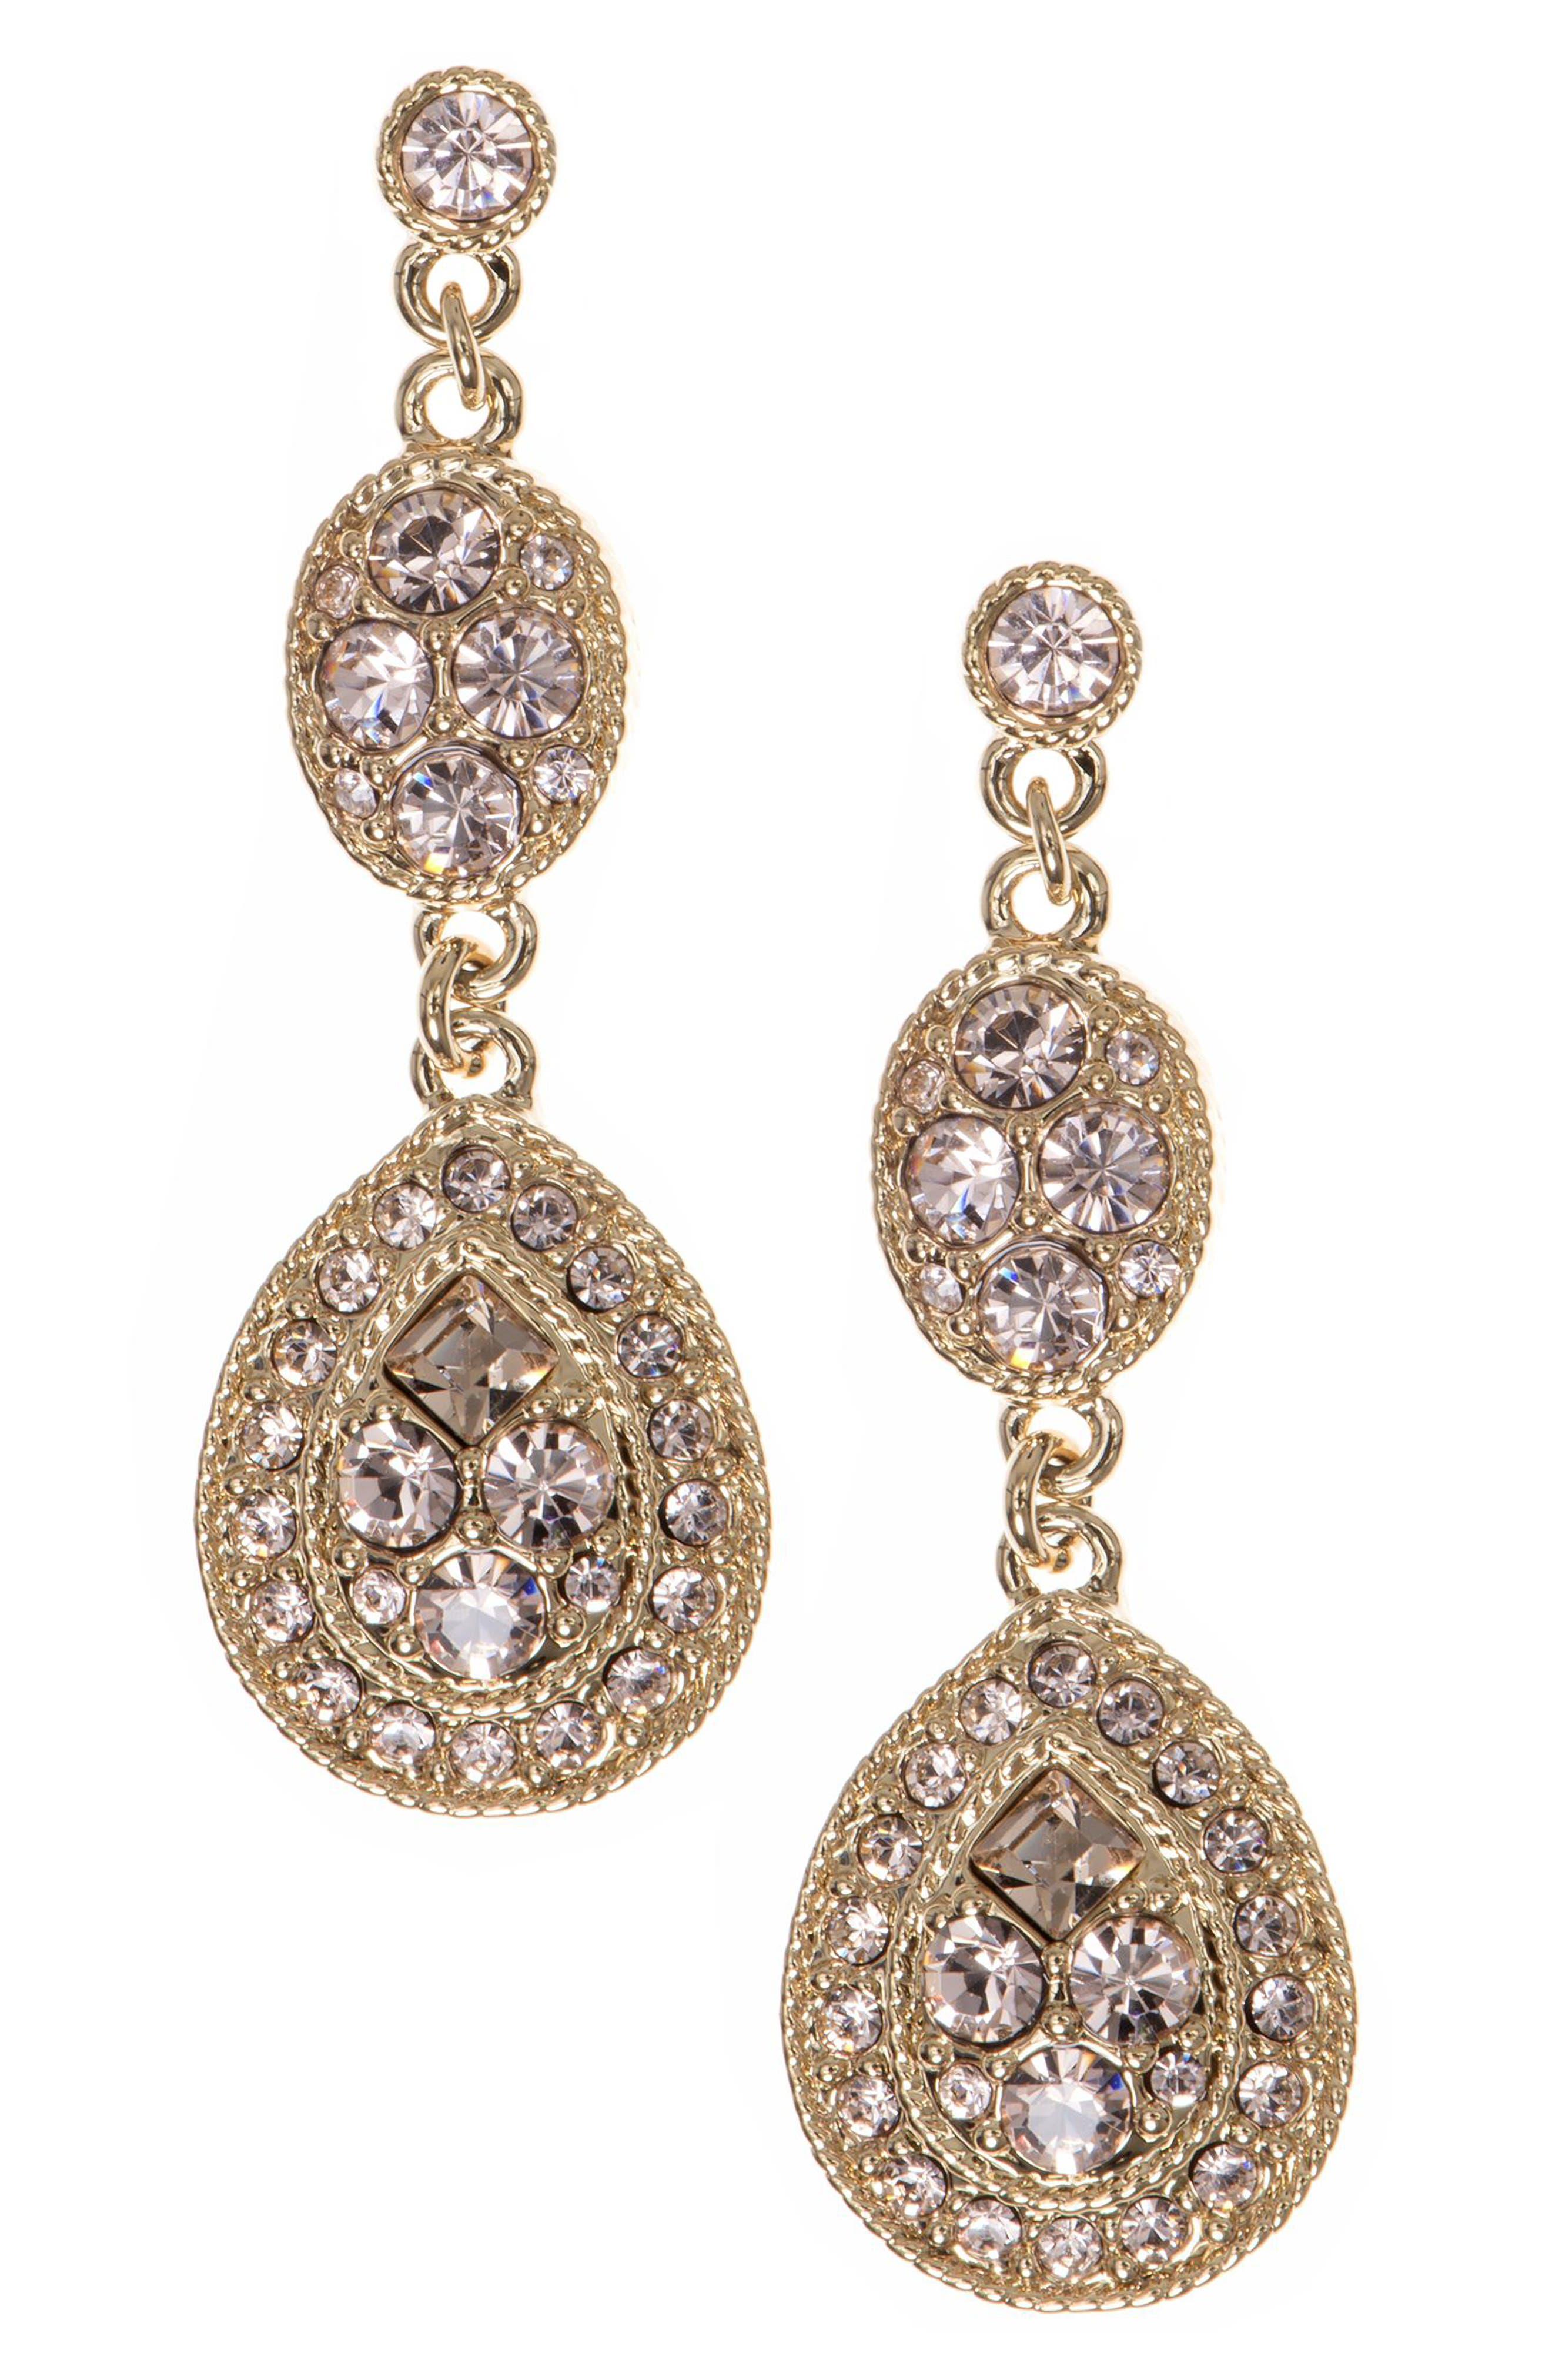 GIVENCHY,                             Crystal Drop Earrings,                             Main thumbnail 1, color,                             GOLD / SILK